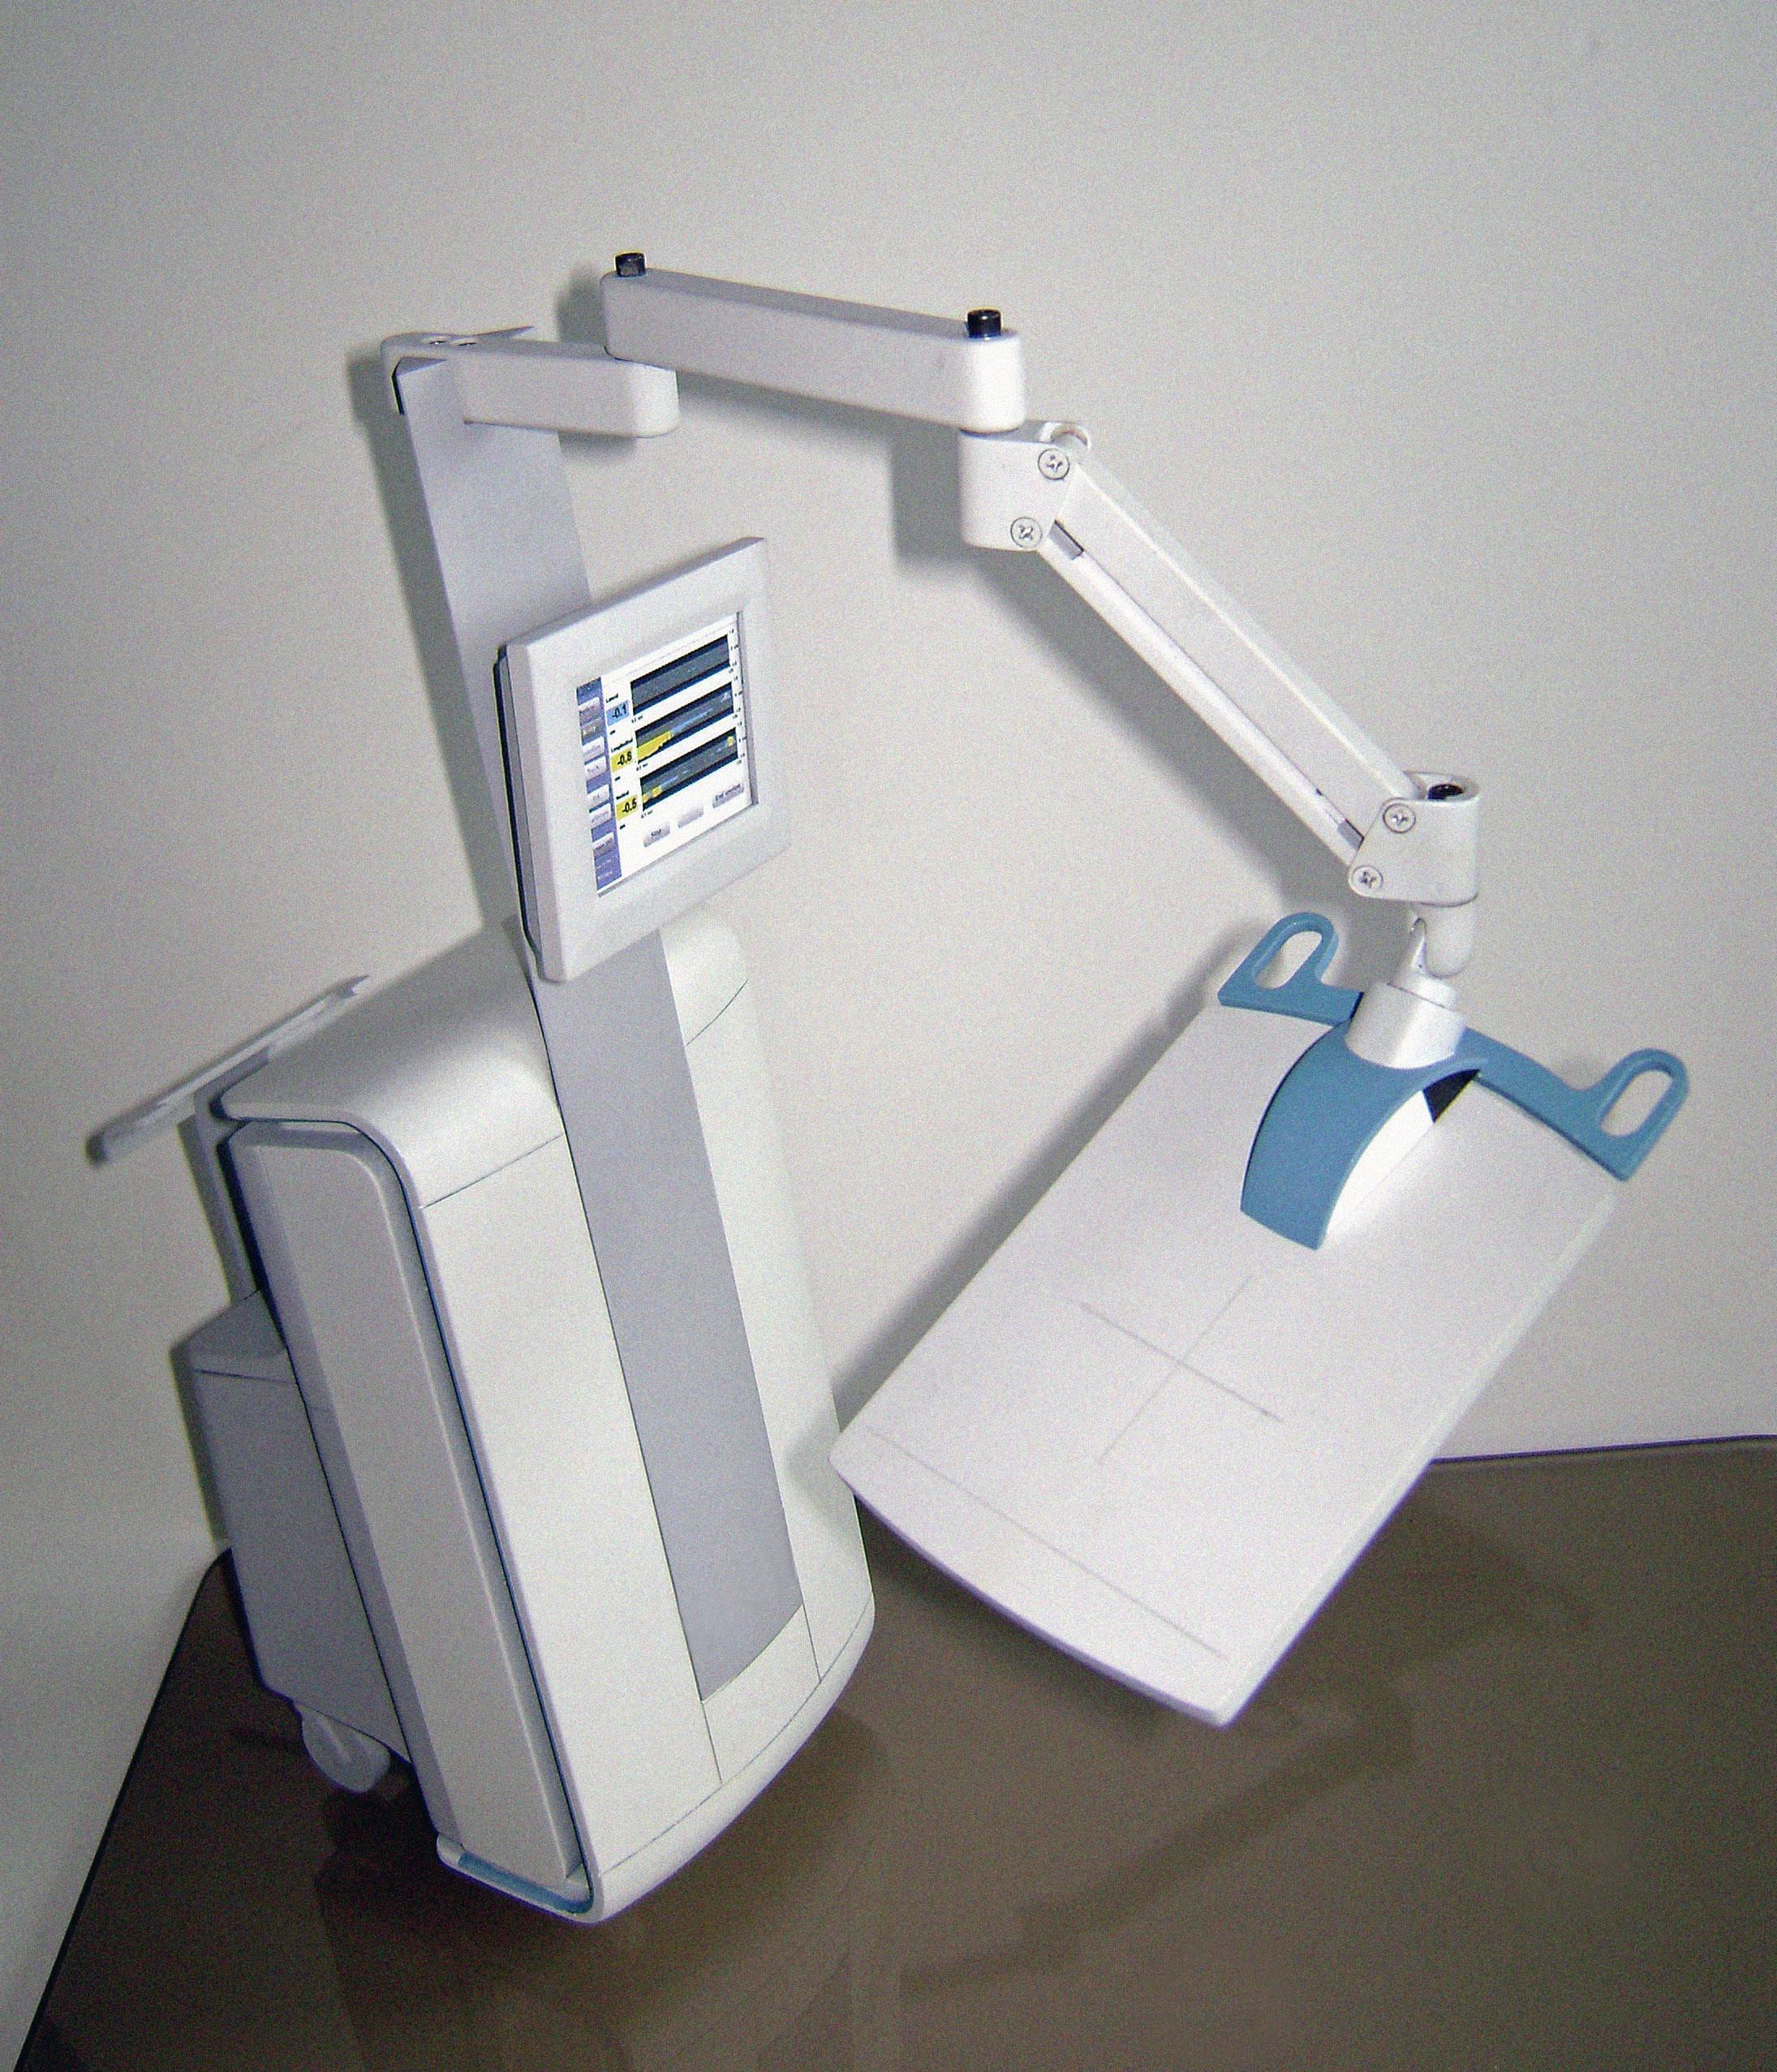 Scanner Model 3